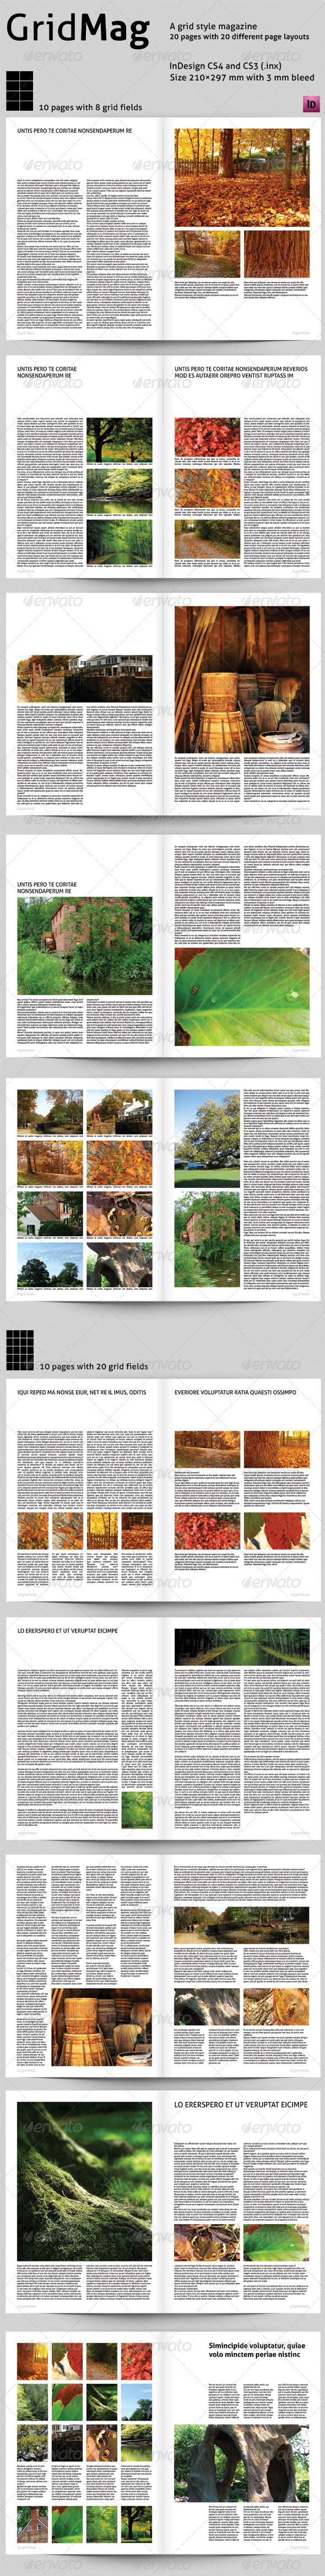 Grid Mag - A Grid Style Magazine - Magazines Print Templates